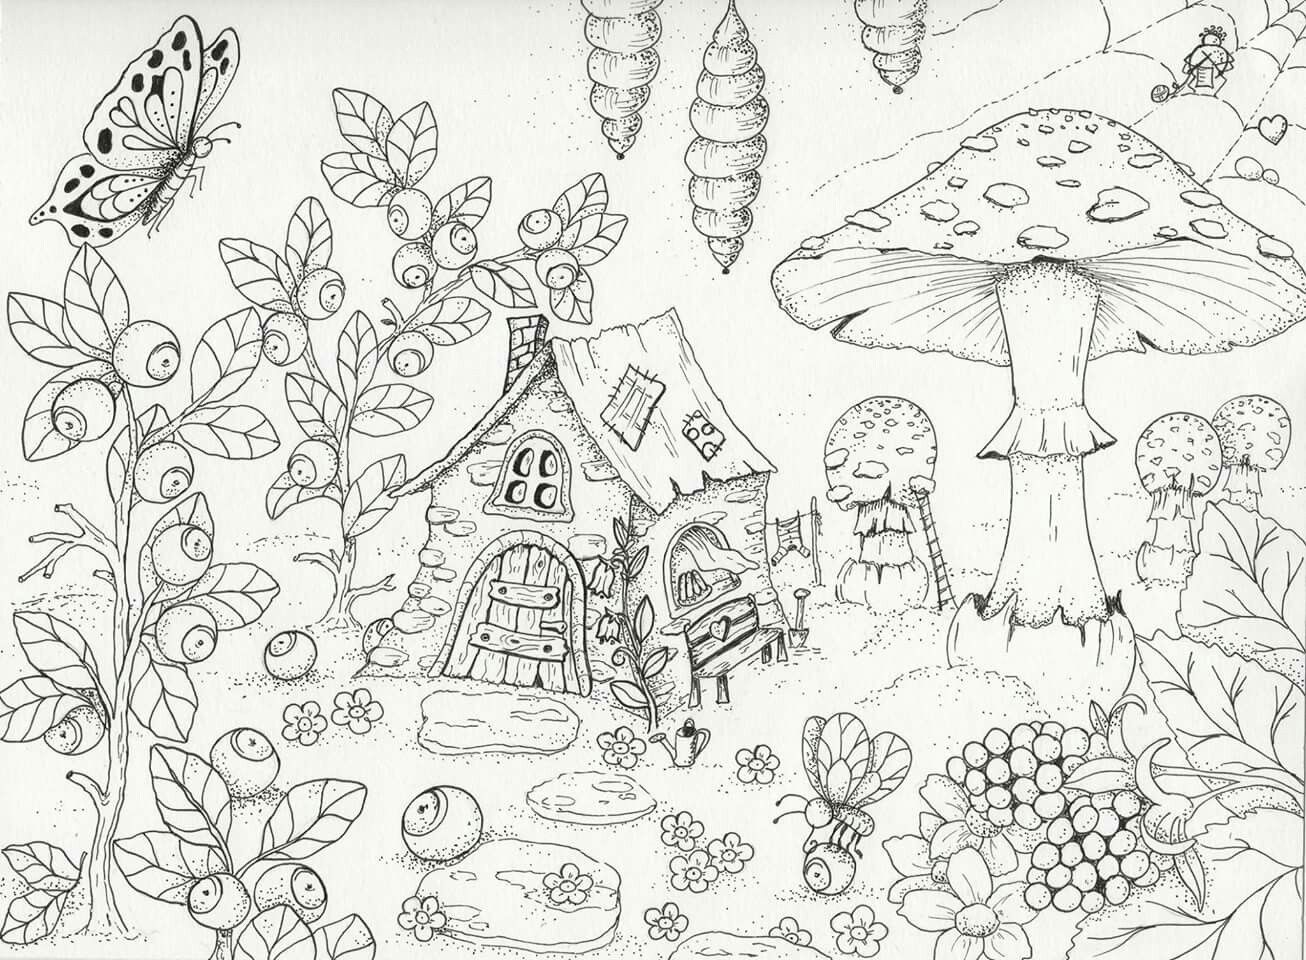 Ausmalbilder Tinkerbell Klara : Pin By Lorraine Mitchell On Coloring Pinterest Coloring Books